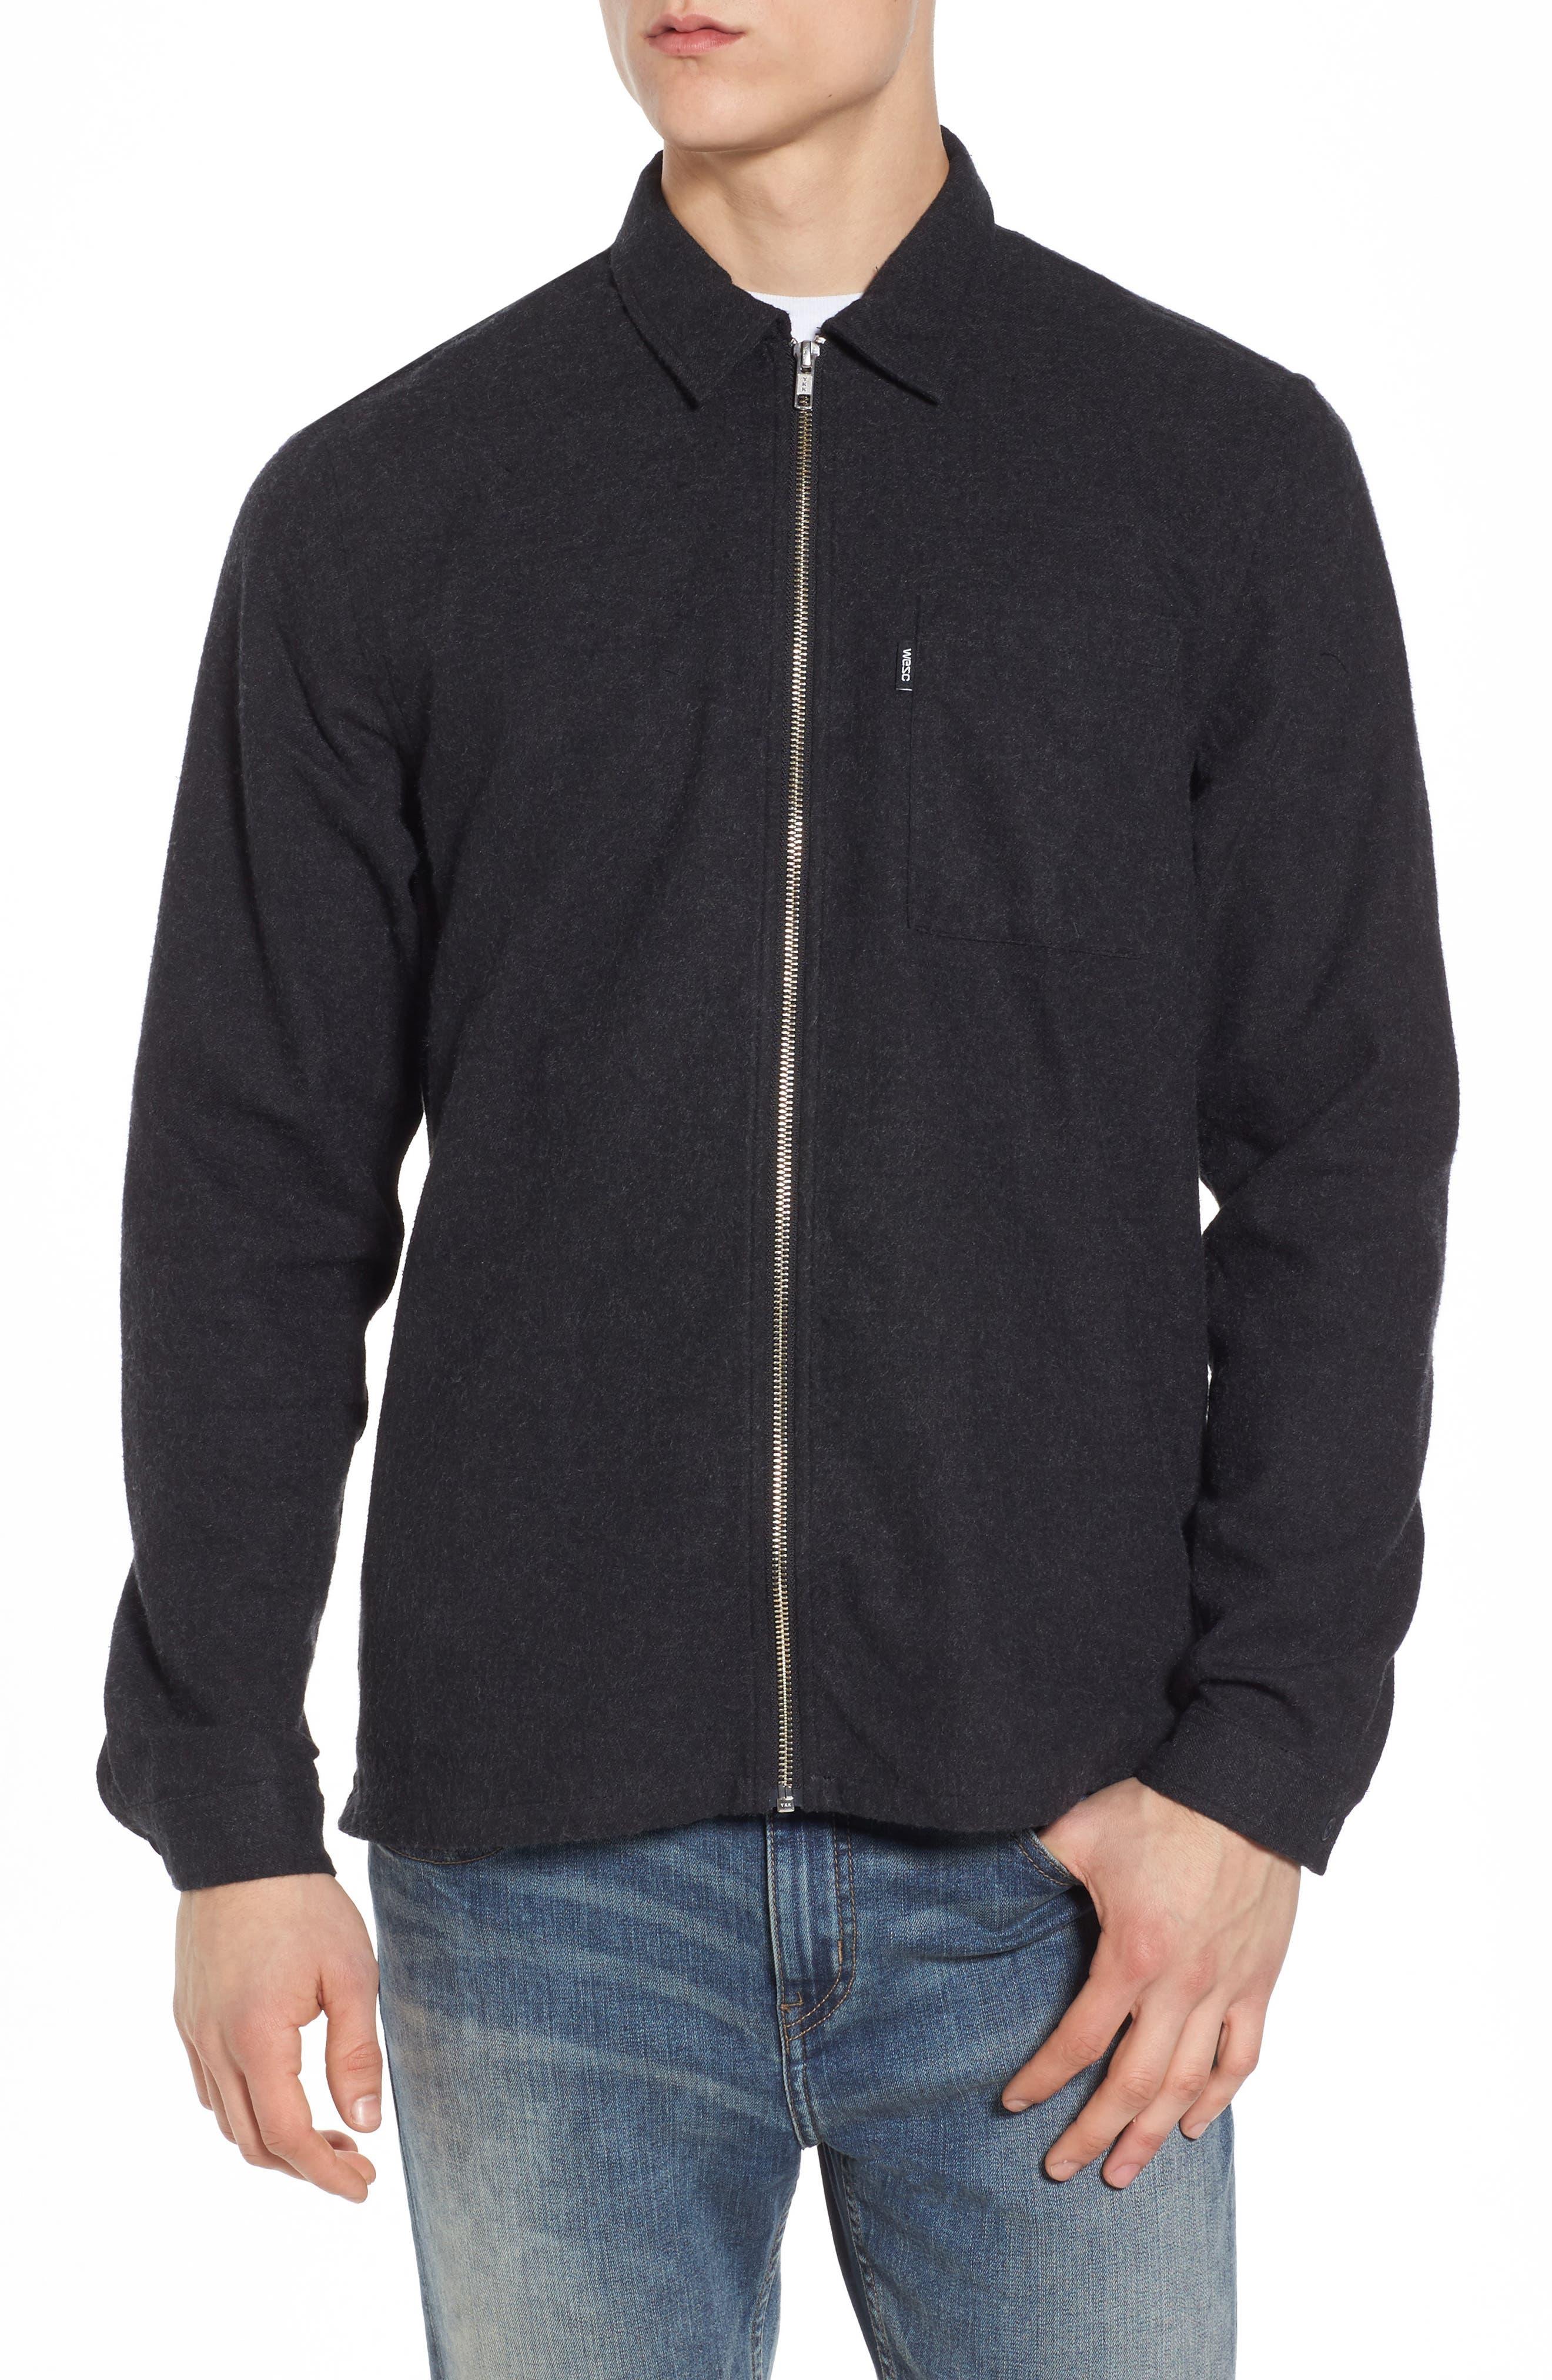 Nicks Flannel Zip Overshirt,                             Main thumbnail 1, color,                             001